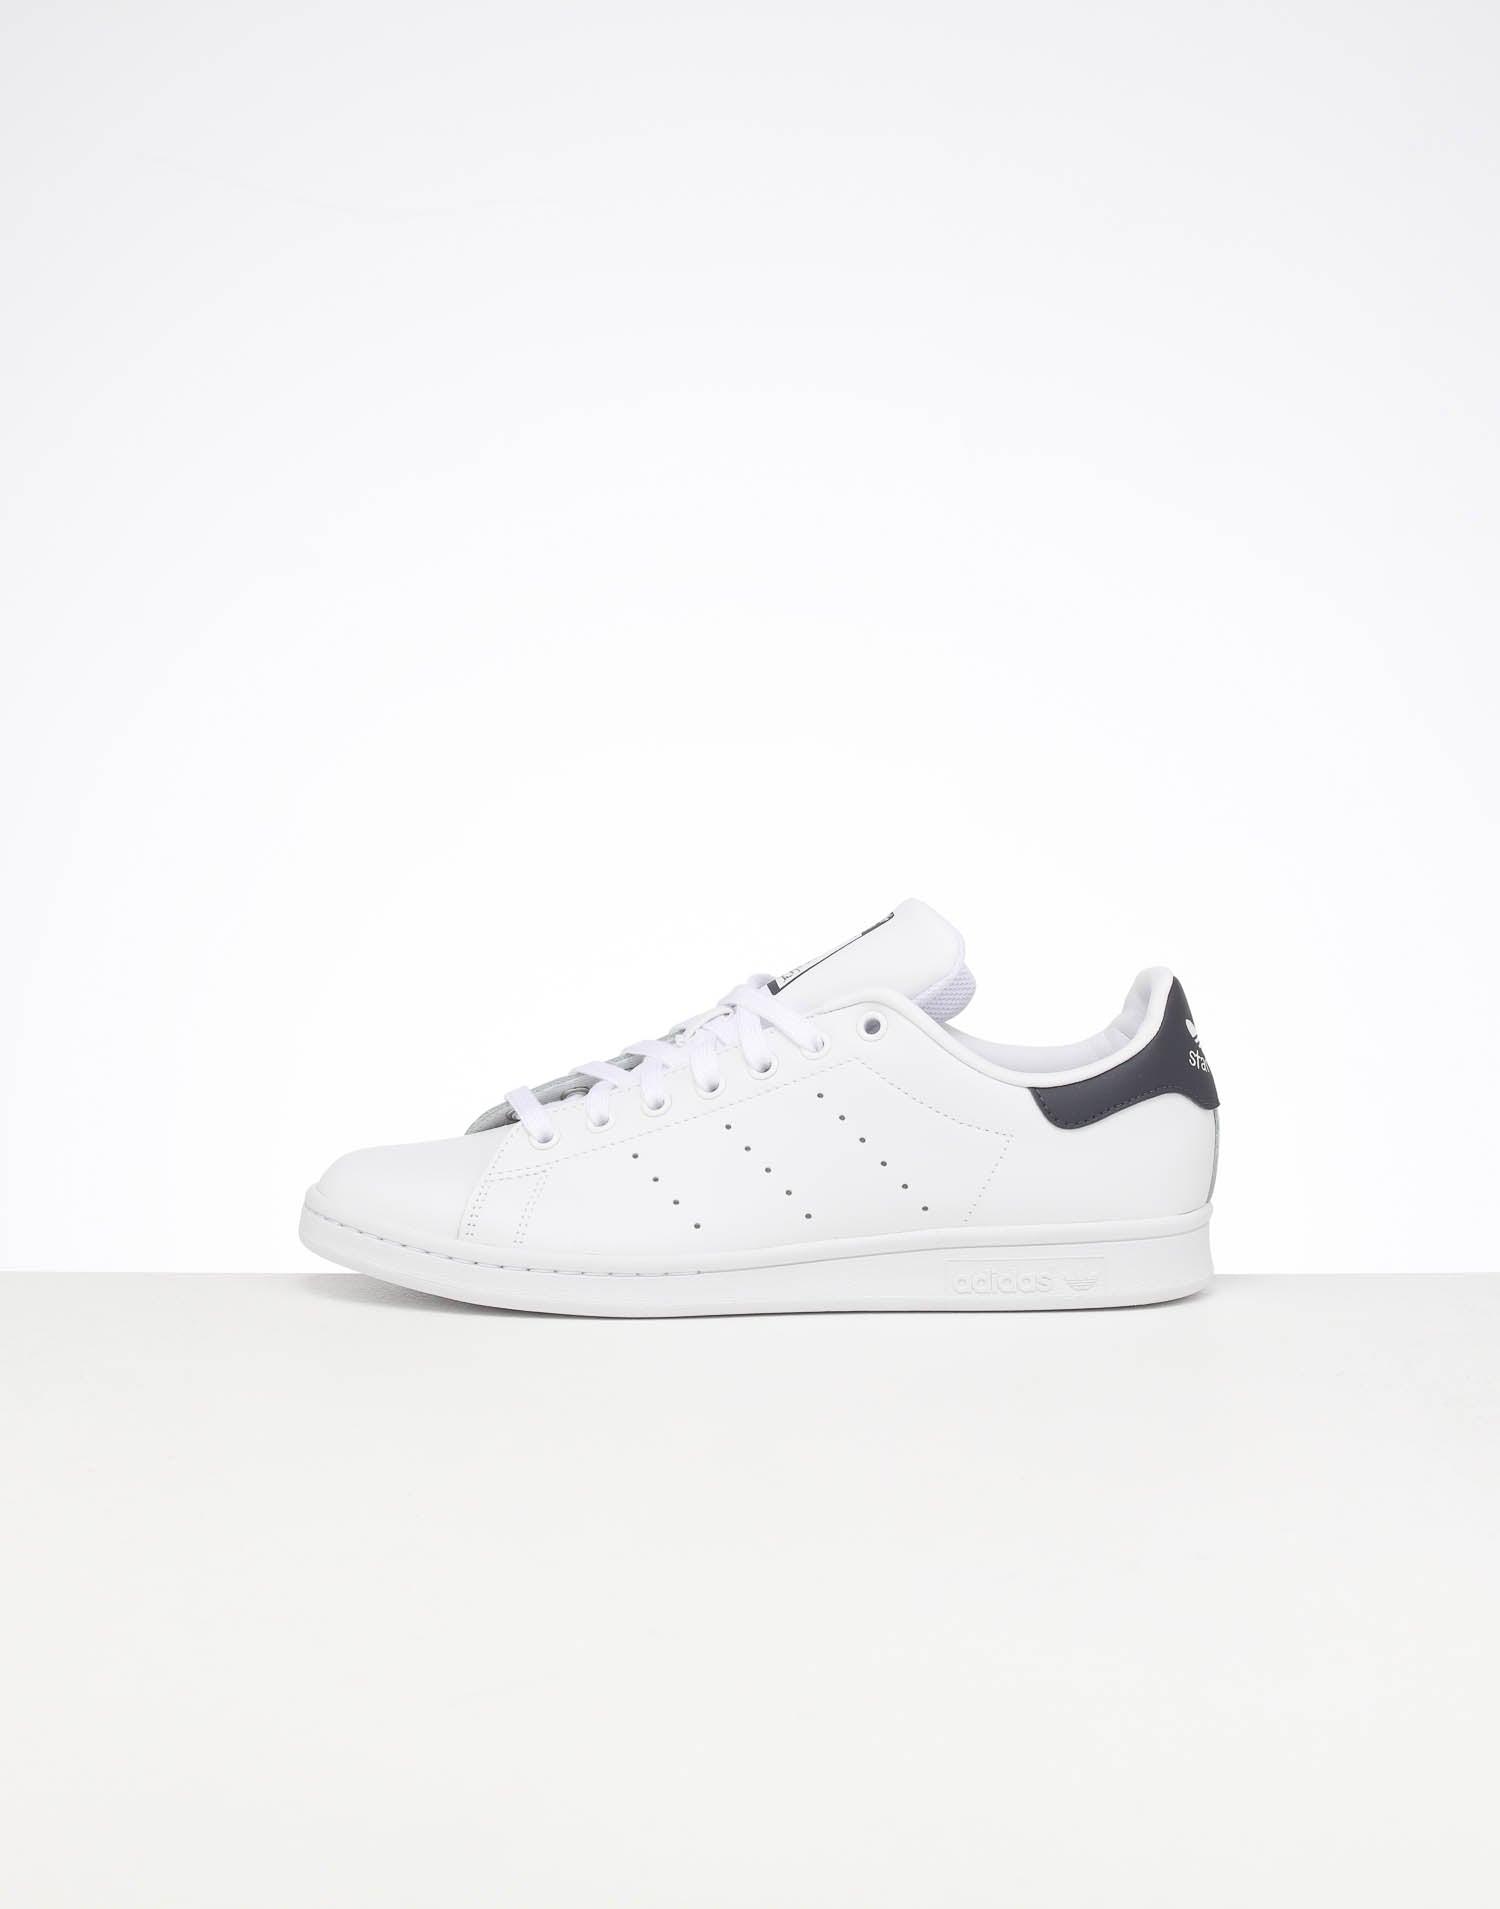 Men's Adidas Footwear Shop Shoes & Sneakers | Culture